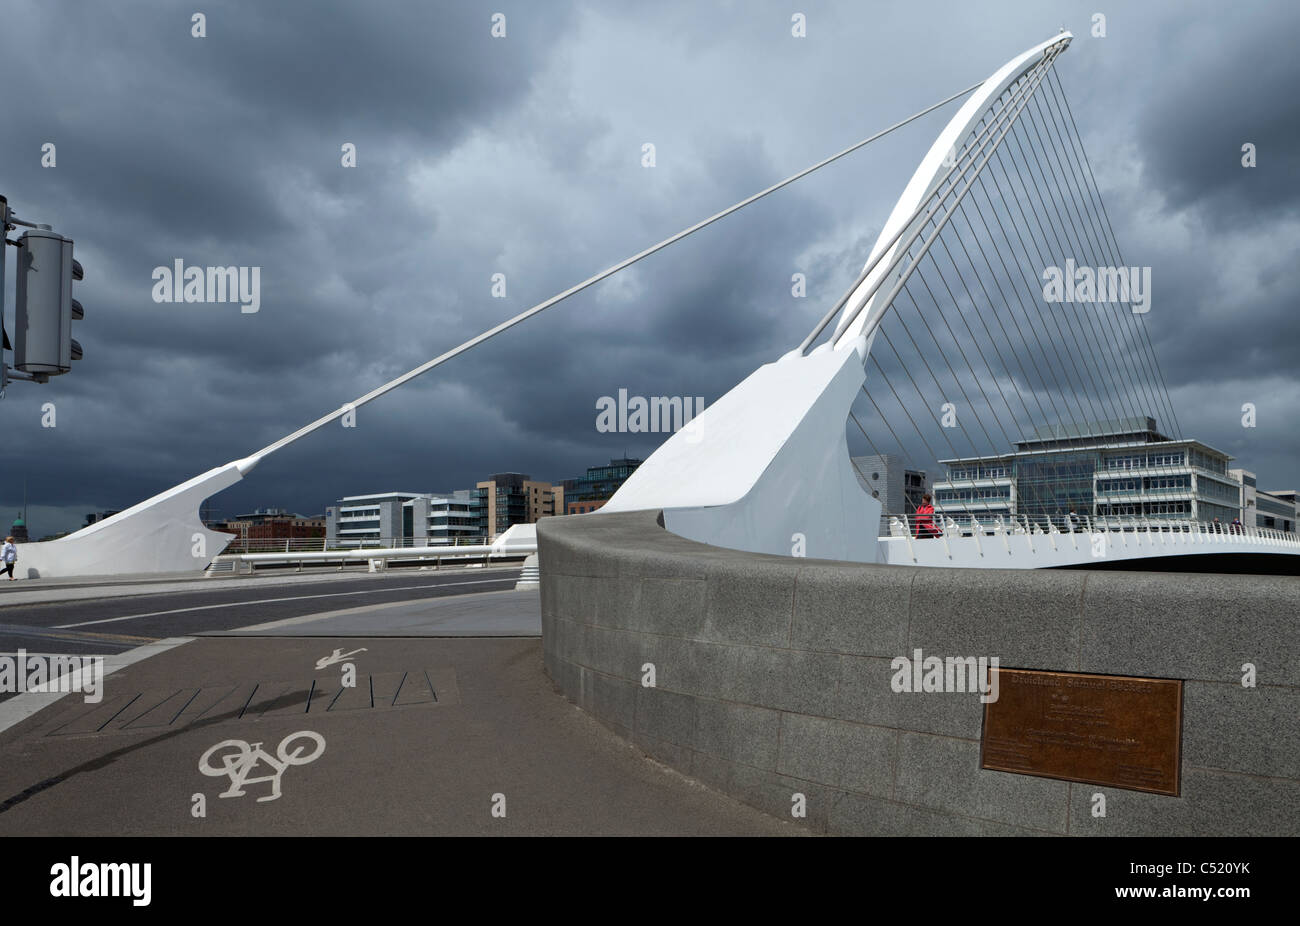 The Samuel Beckett Bridge over the River Liffey, Dublin City, Ireland Stock Photo